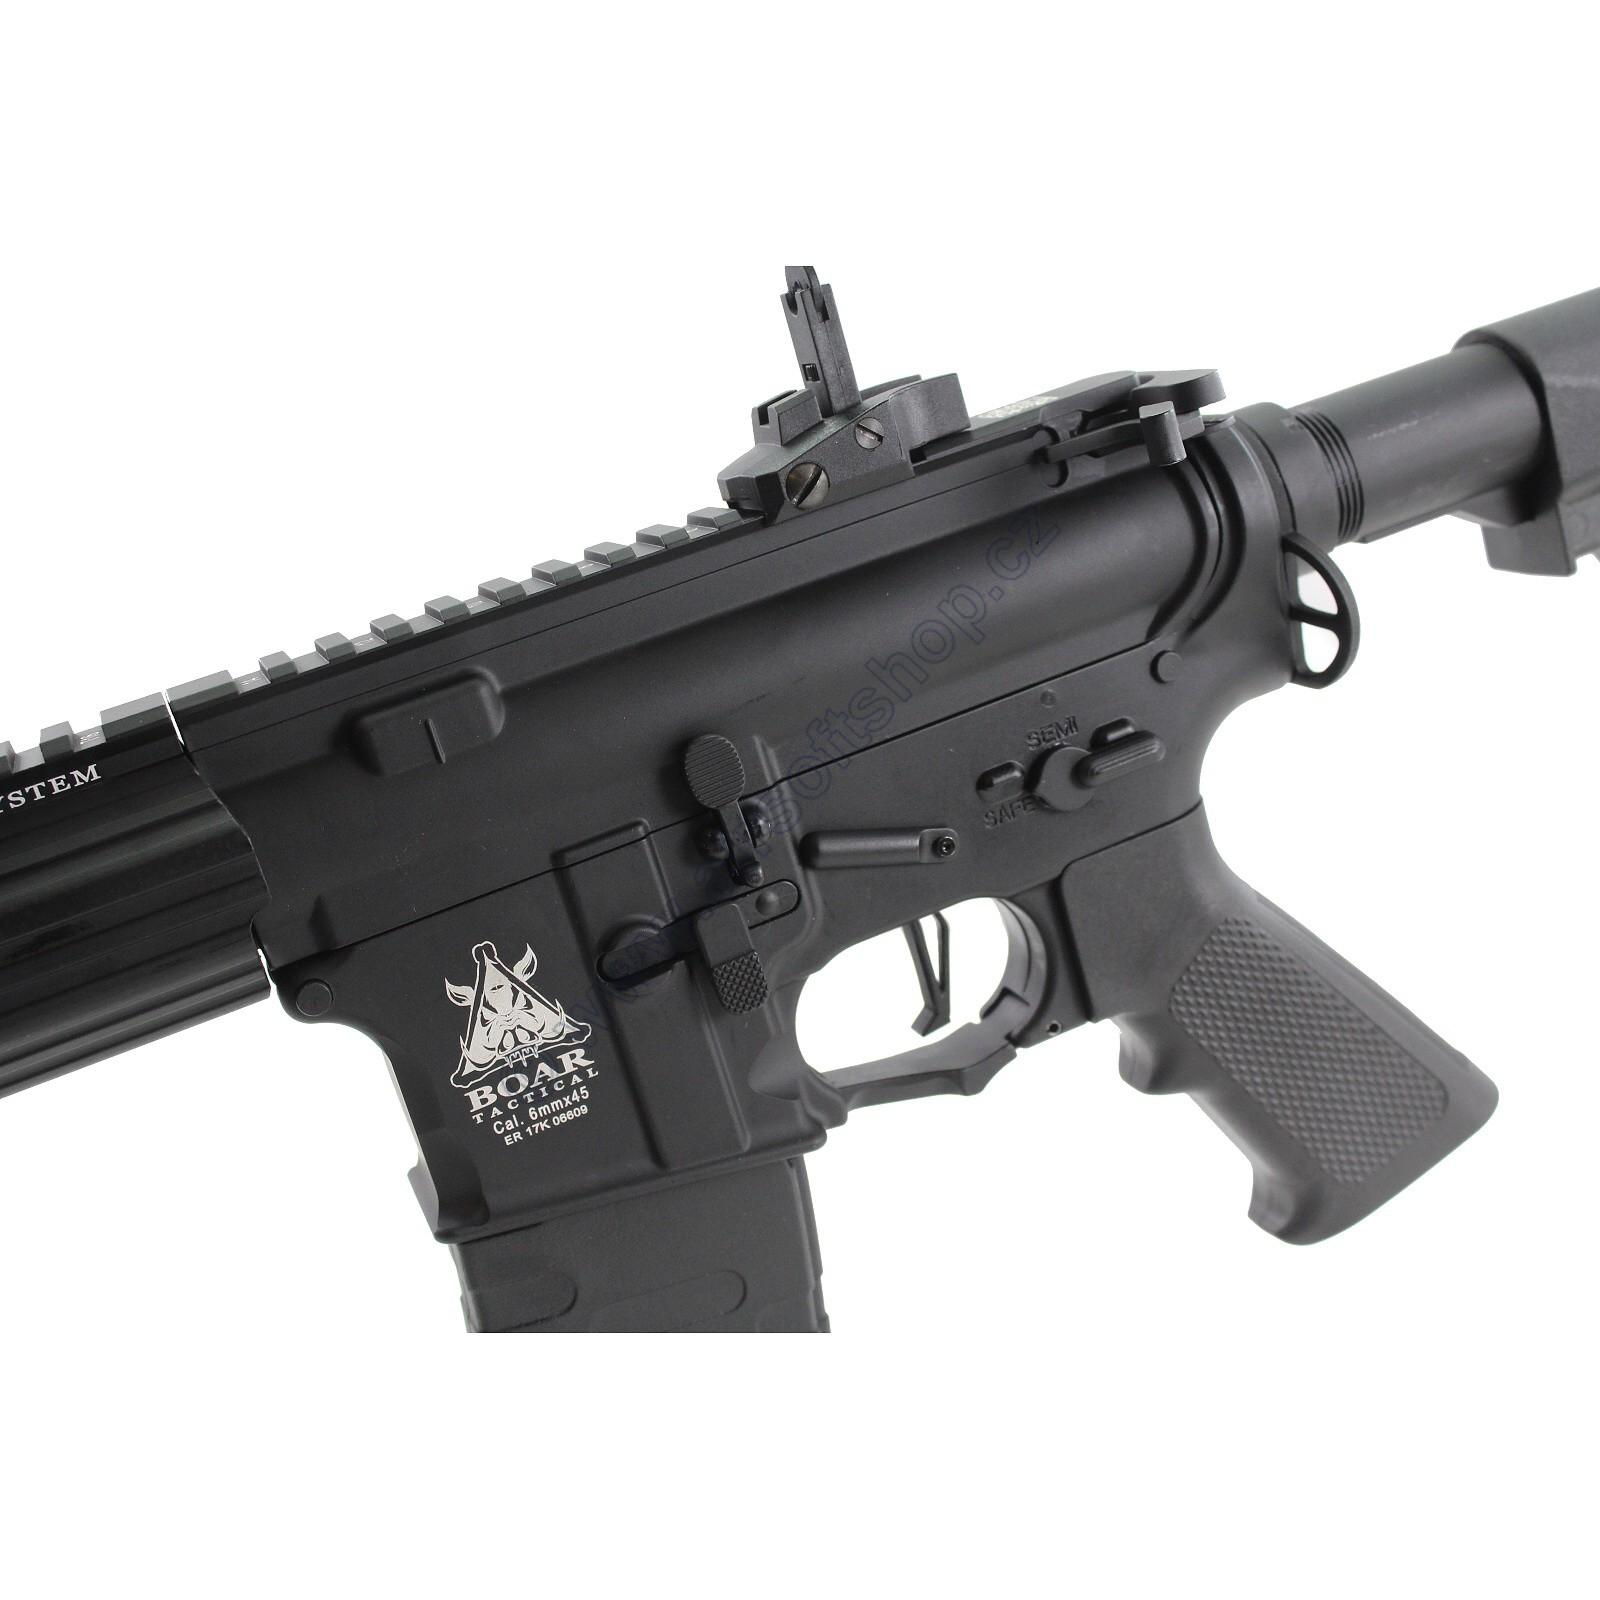 RIFLE DE AIRSOFT AEG M4 BOAR TACTICAL KEYMOD RIFLE FULL METAL BLOWBACK ASR117R1 - APS